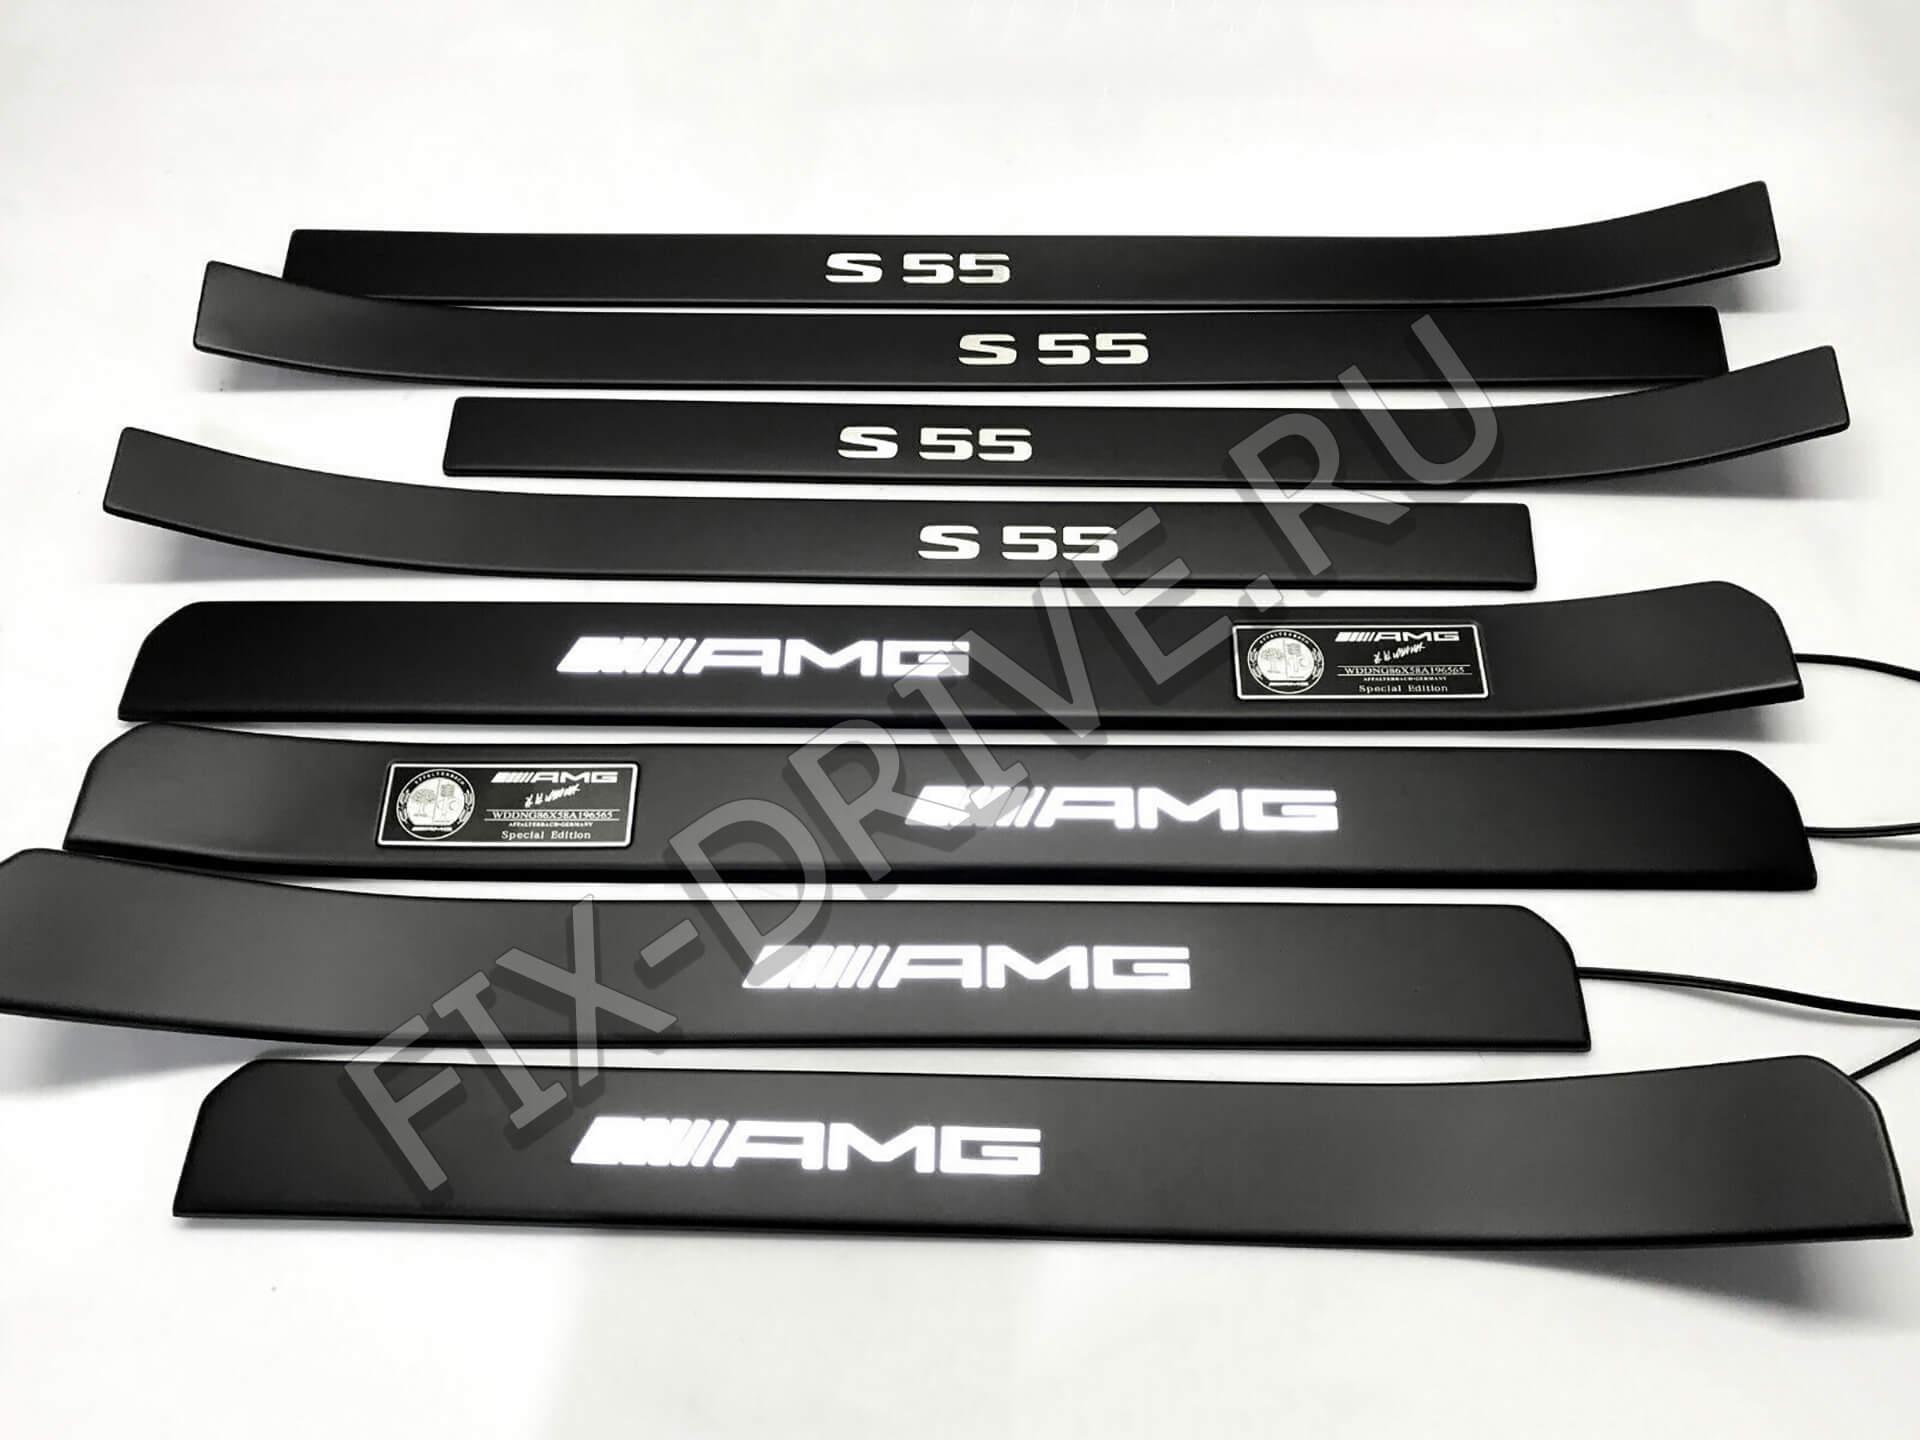 Пороги S55 AMG w221 S-Class Mercedes